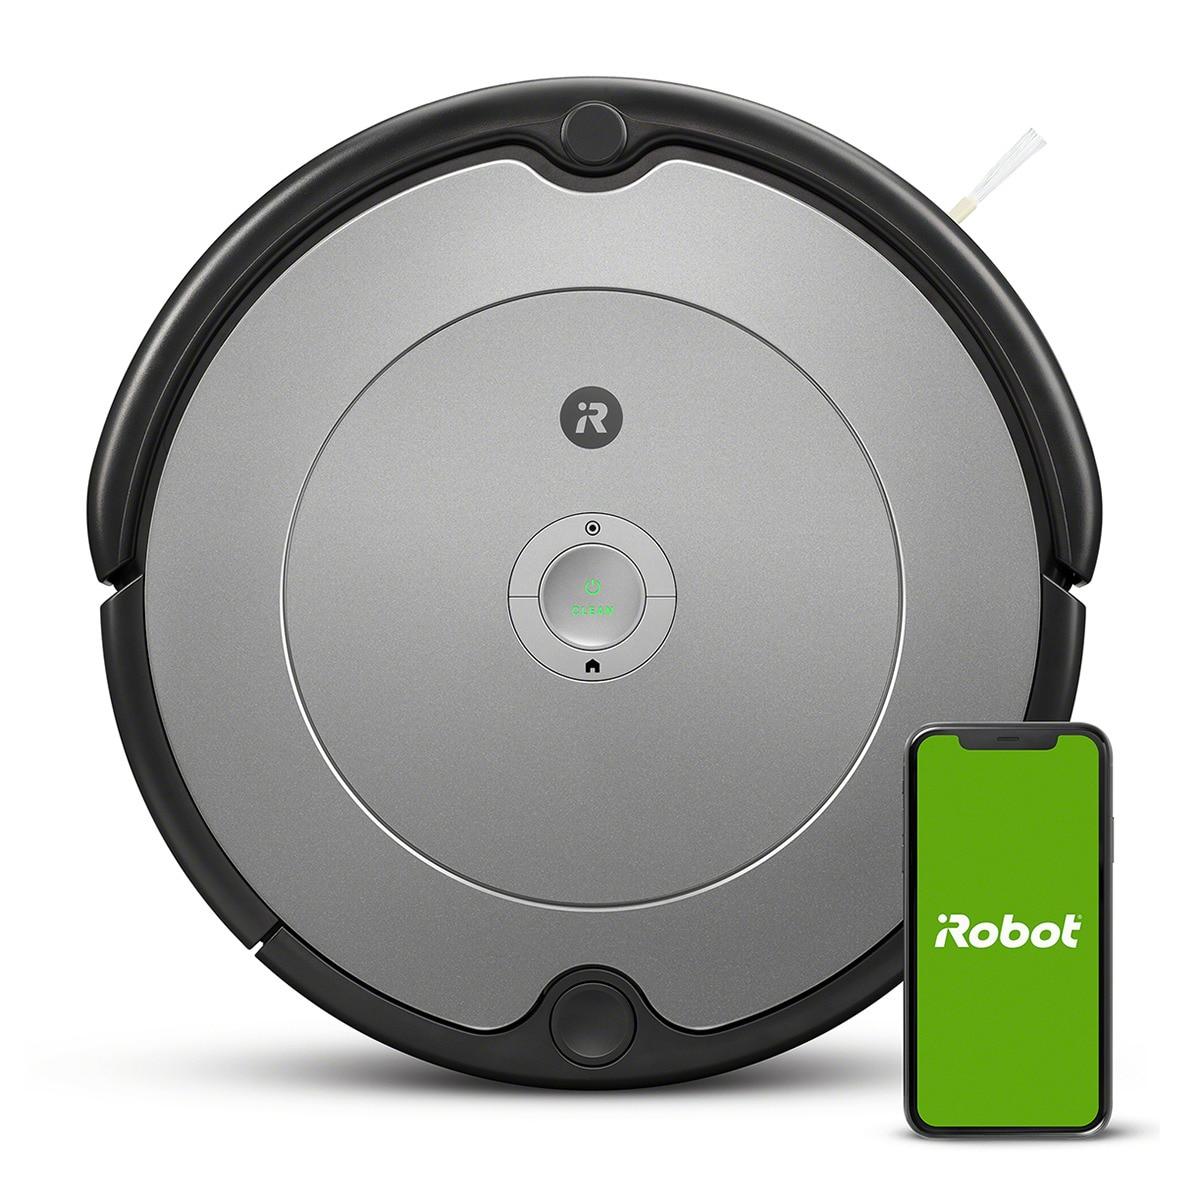 Robot aspirador iRobot Roomba 694